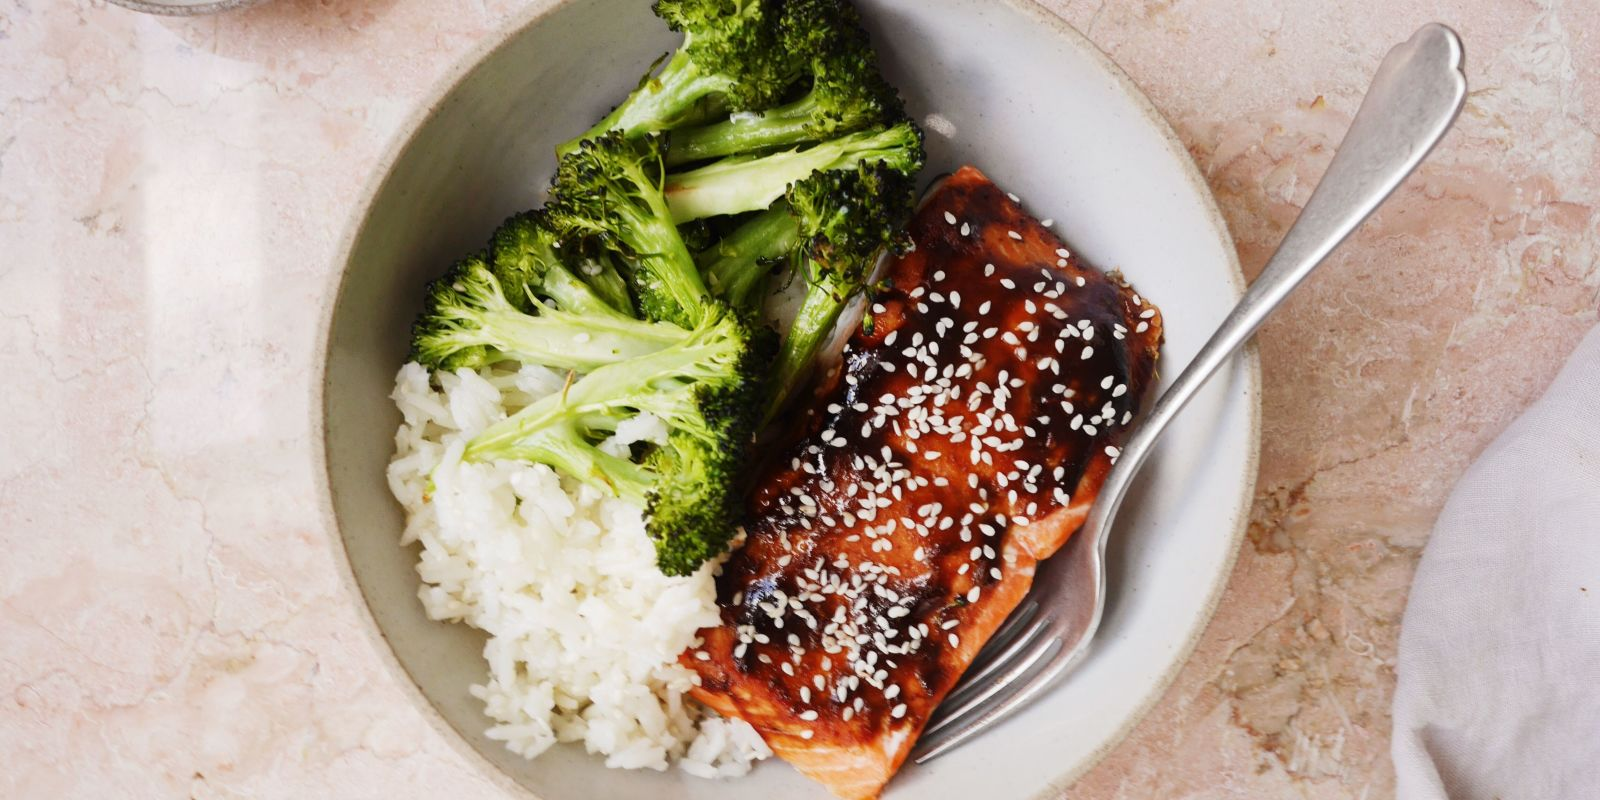 Best Hoisin Glazed Salmon With Broccoli And Sesame Rice